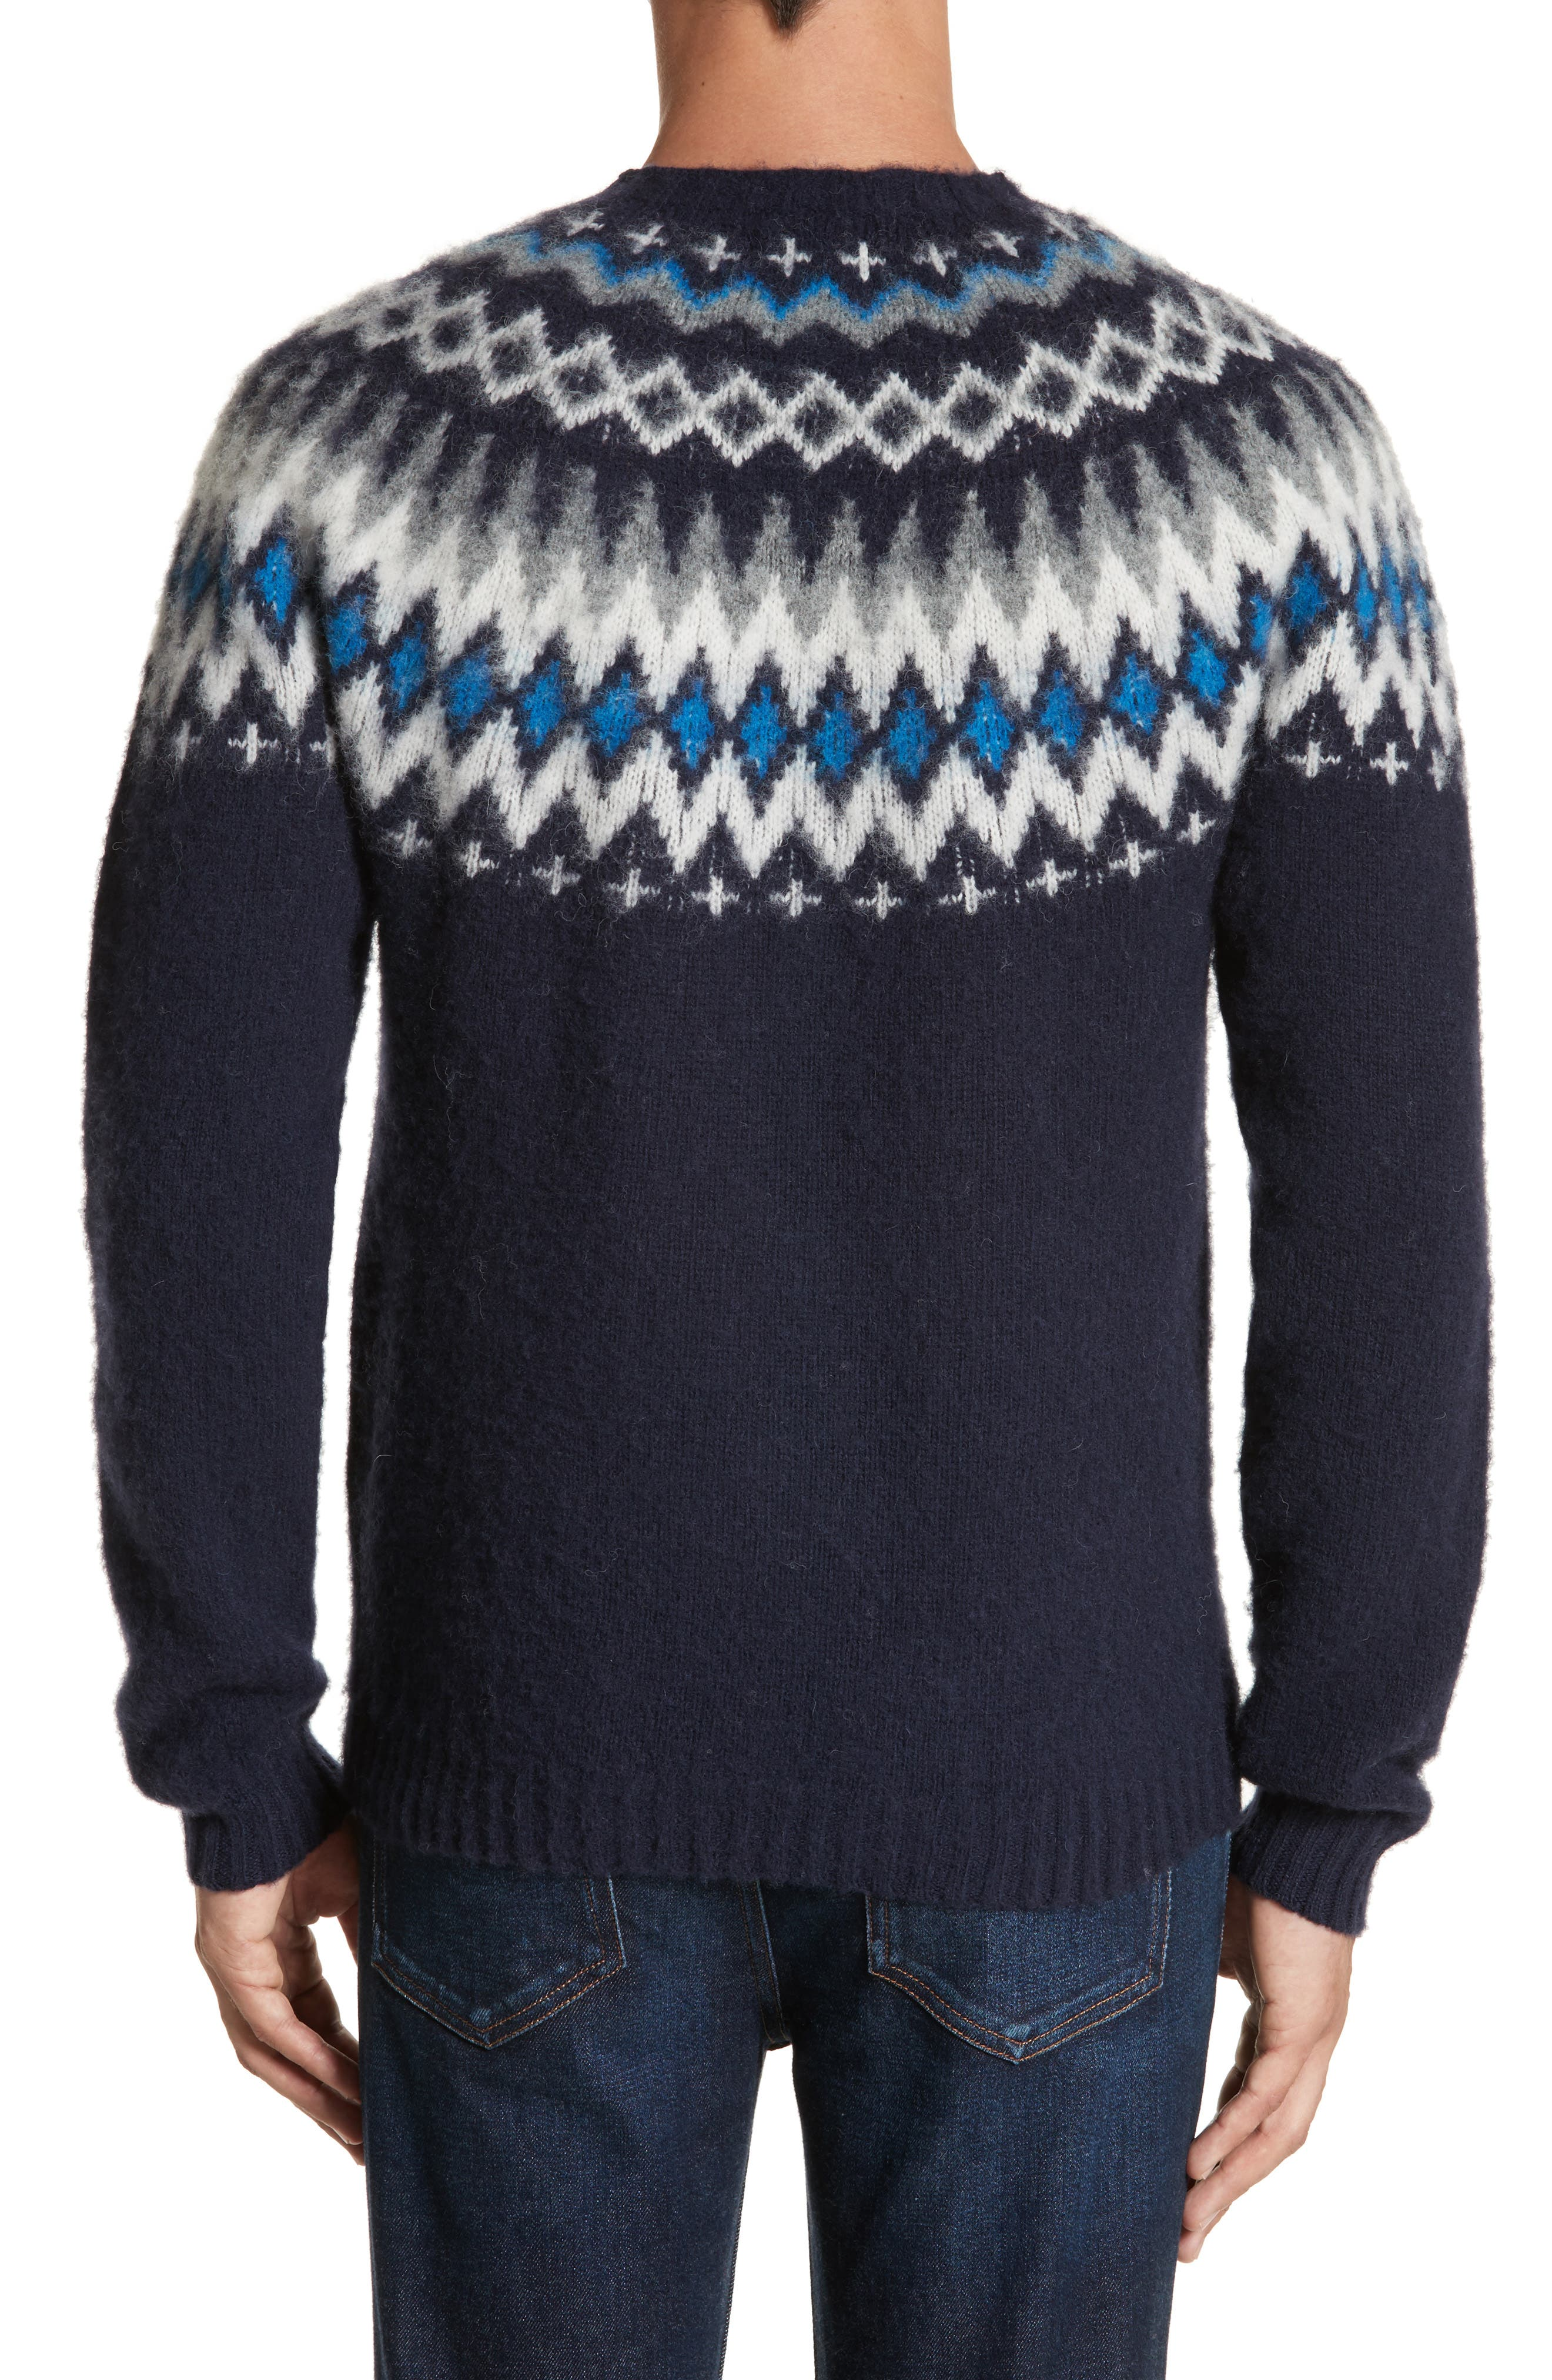 Nirnir Fair Isle Lambswool Sweater,                             Alternate thumbnail 2, color,                             410